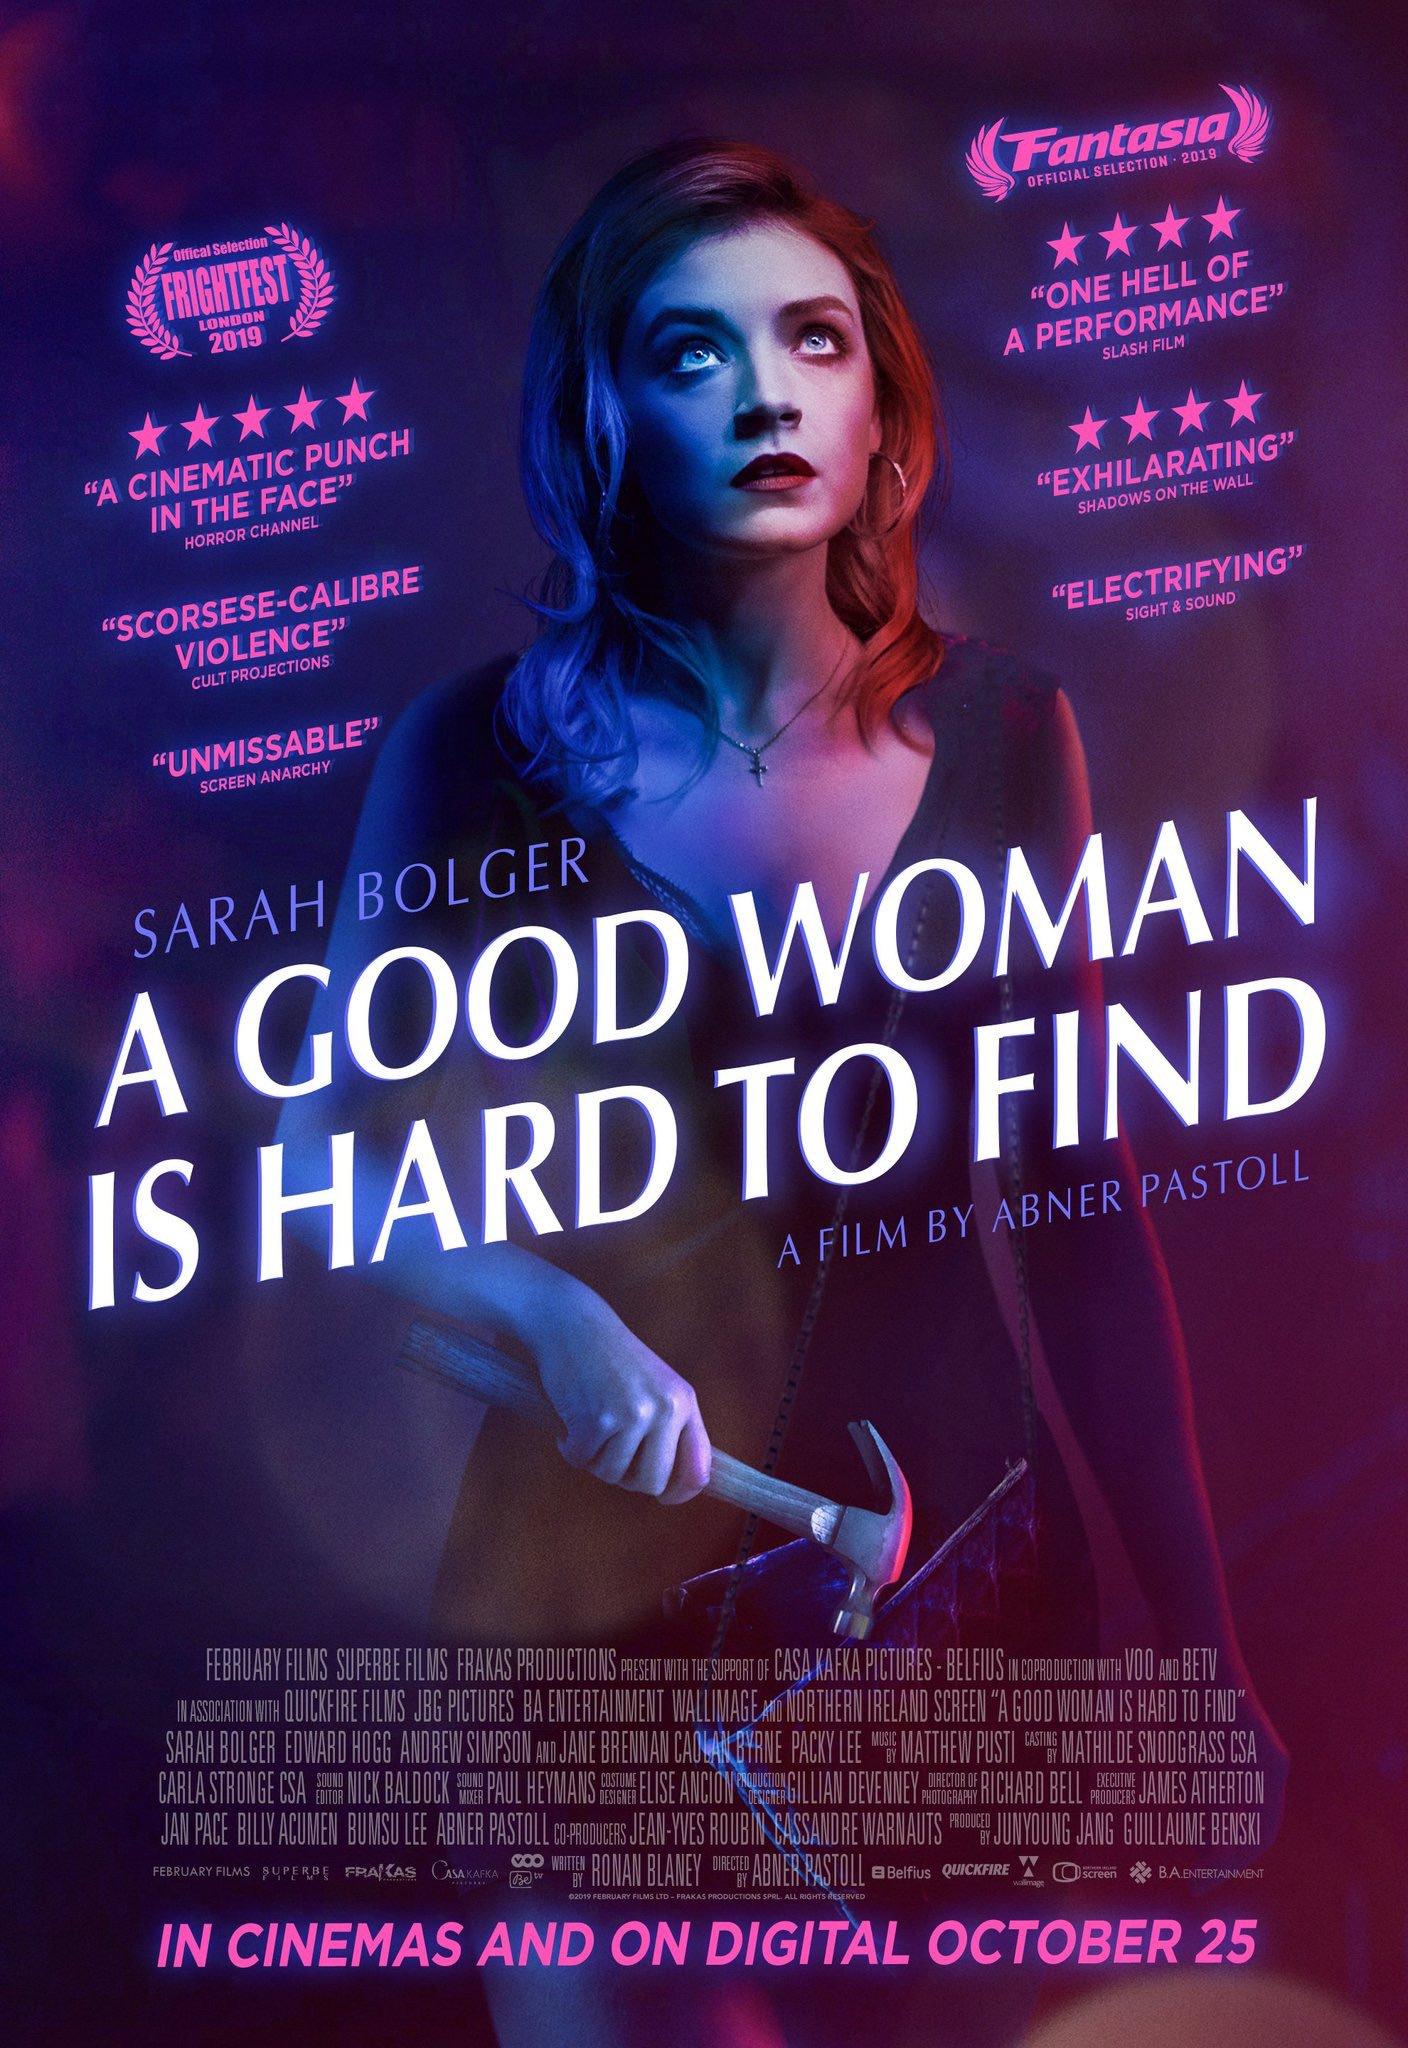 хорошую женщину найти тяжело 2019 постер